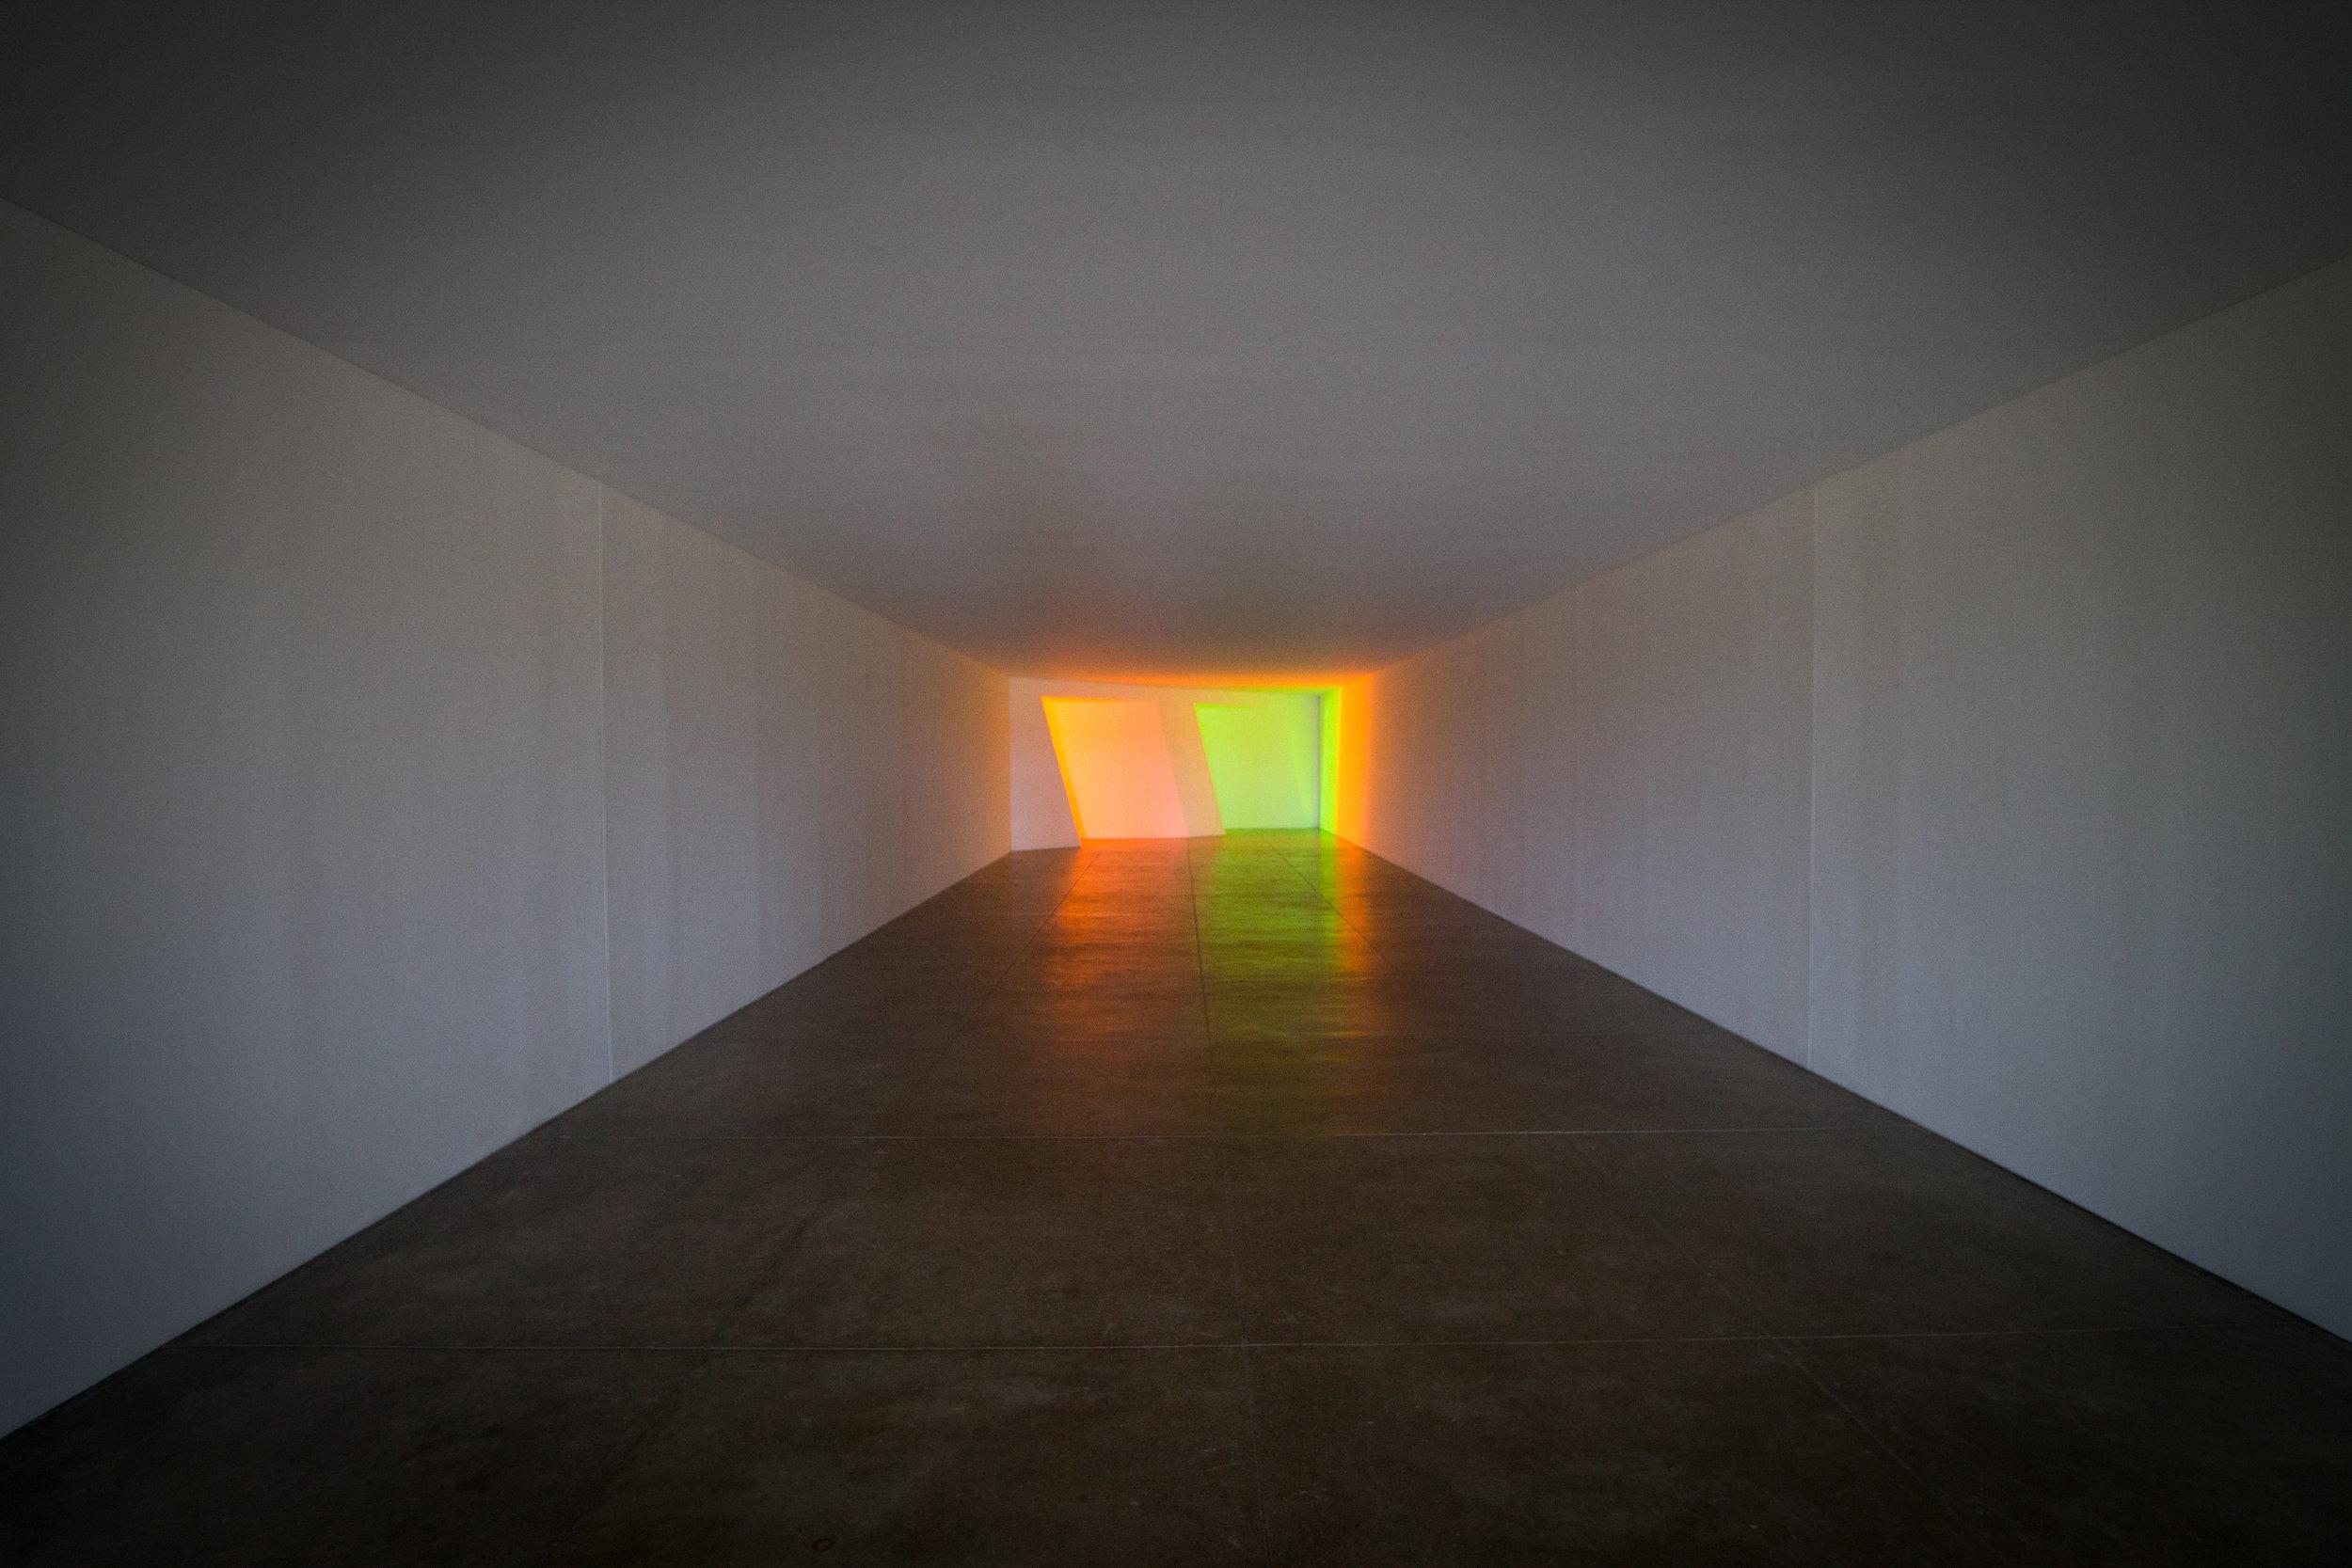 Dan Flavin, Minimalist Light & Perspective Works, 1996.